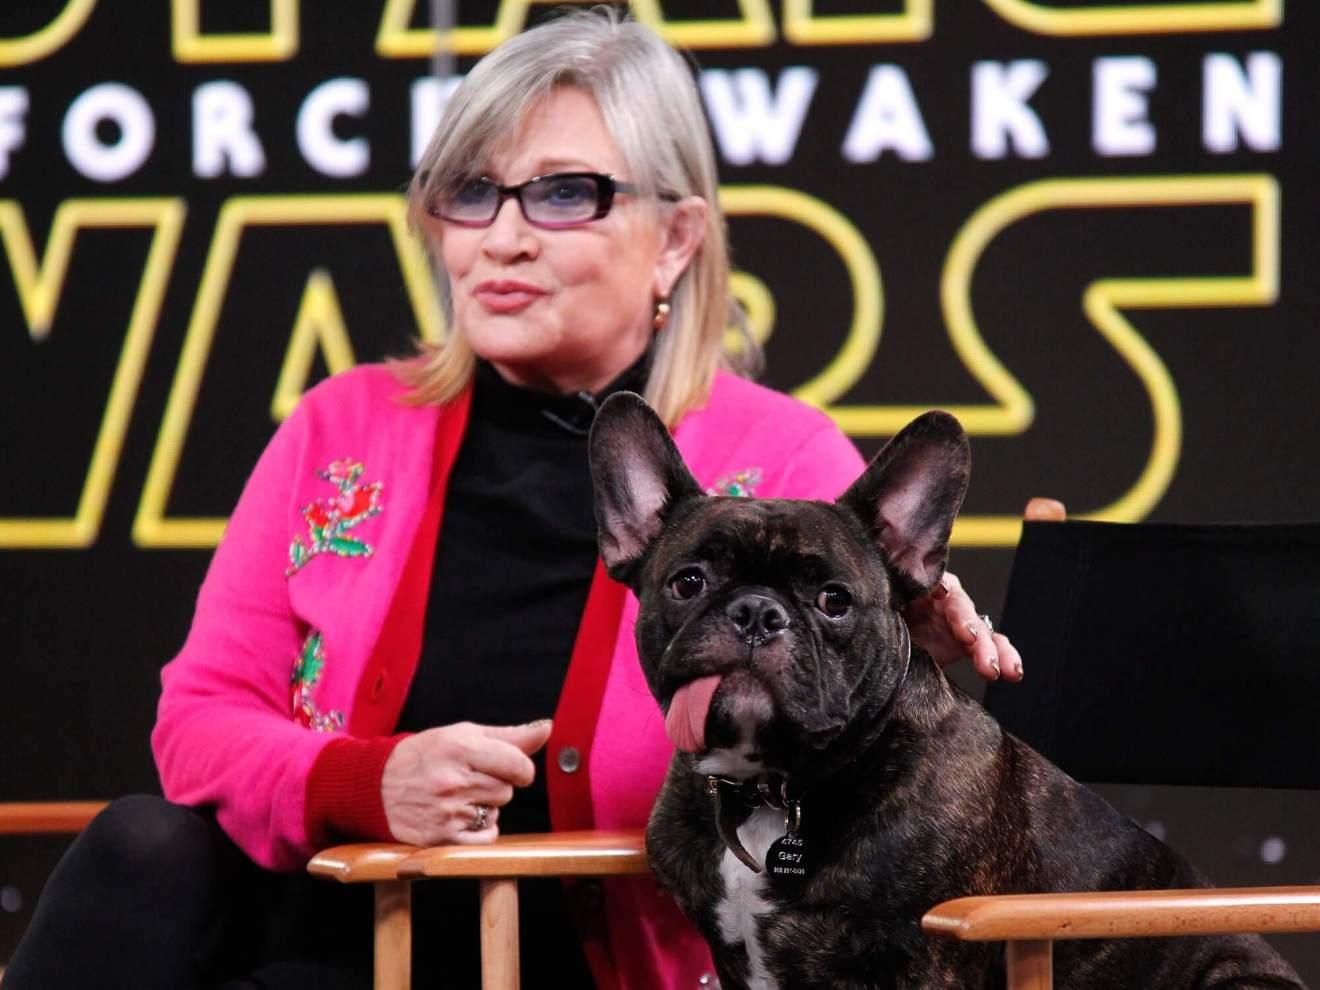 1 ano sem Carrie Fisher, a eterna Princesa Leia 8